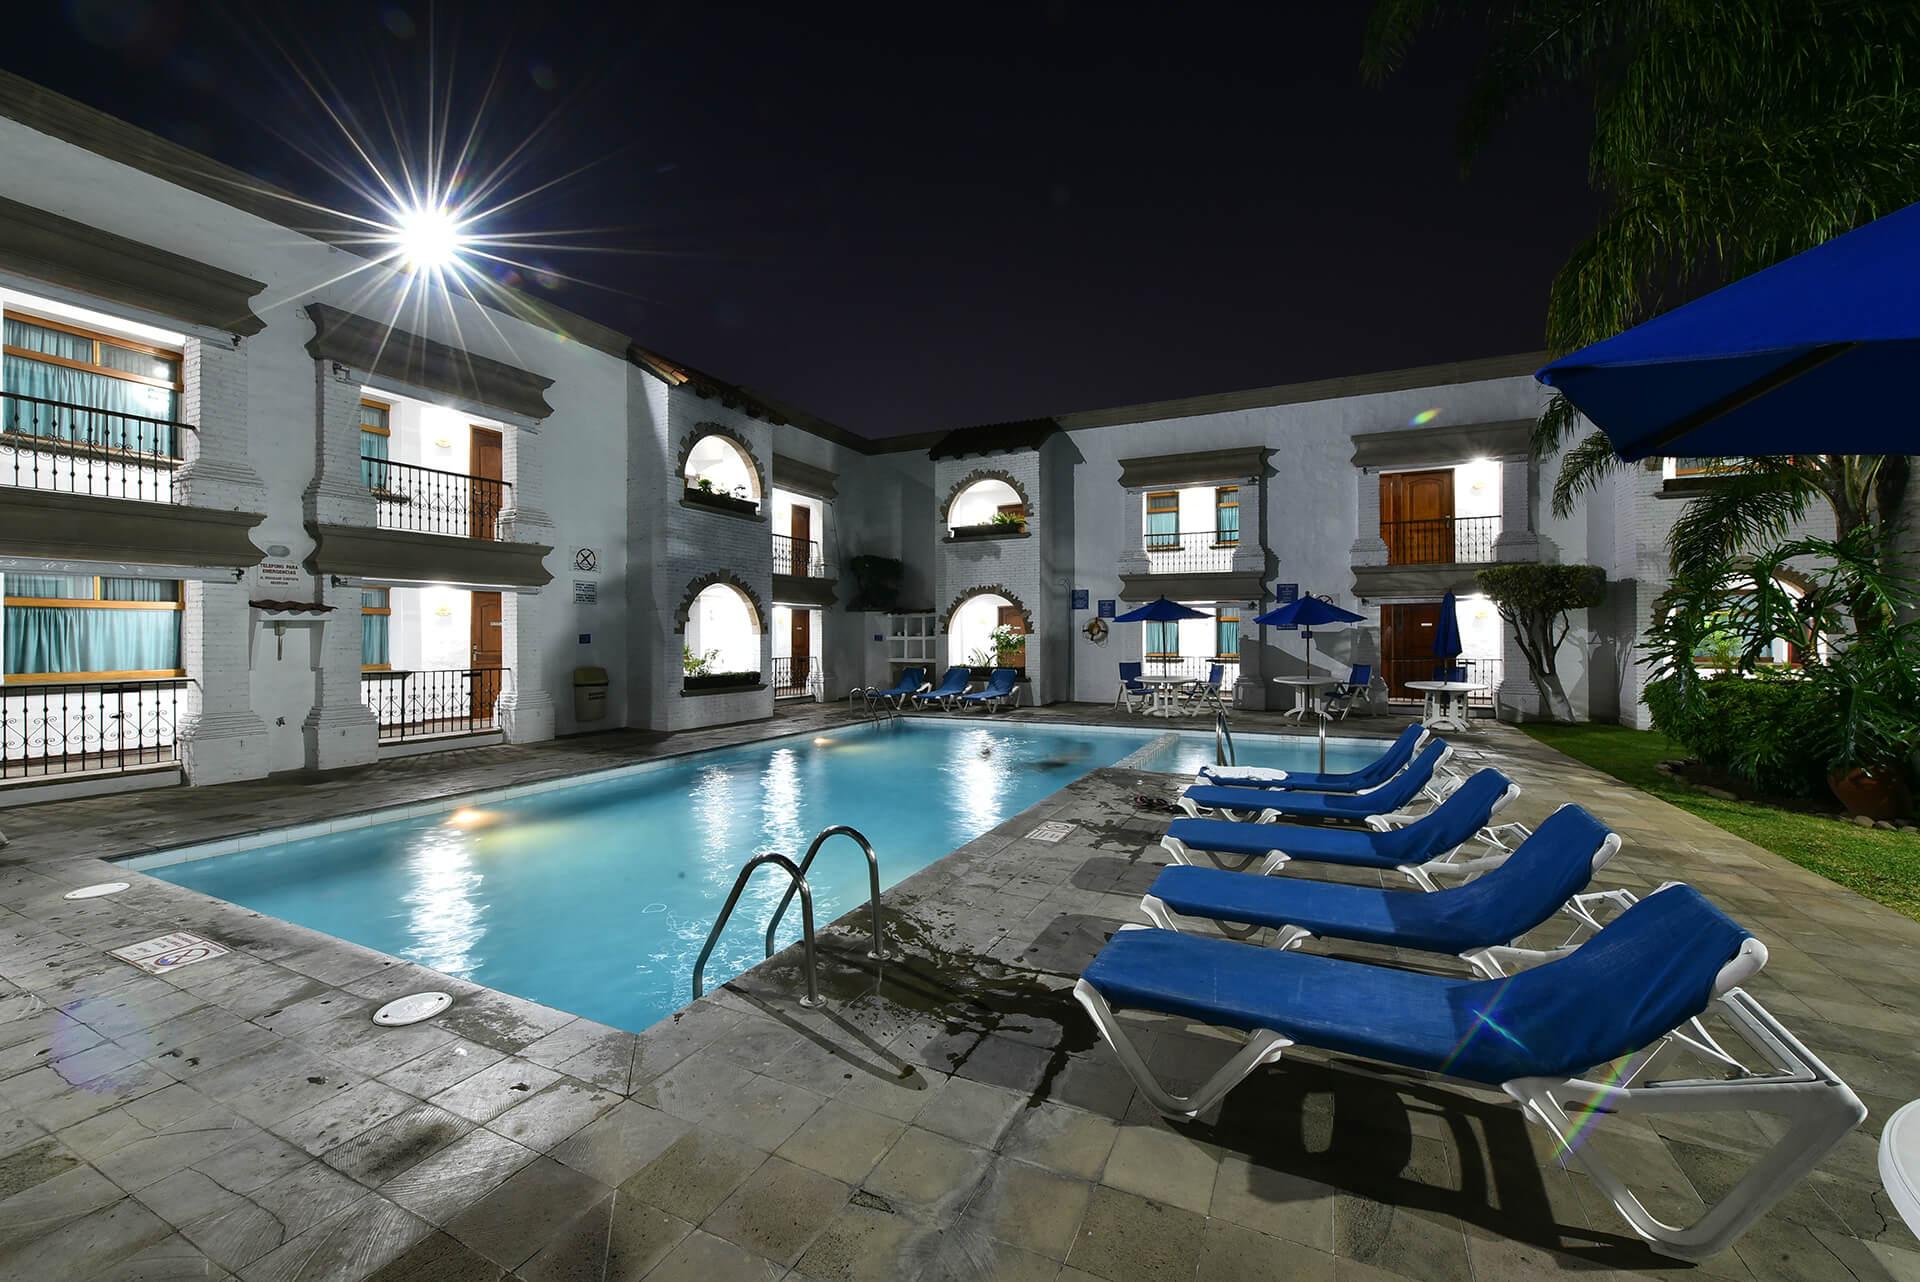 Holiday Inn Express Morelia - Imagen 1